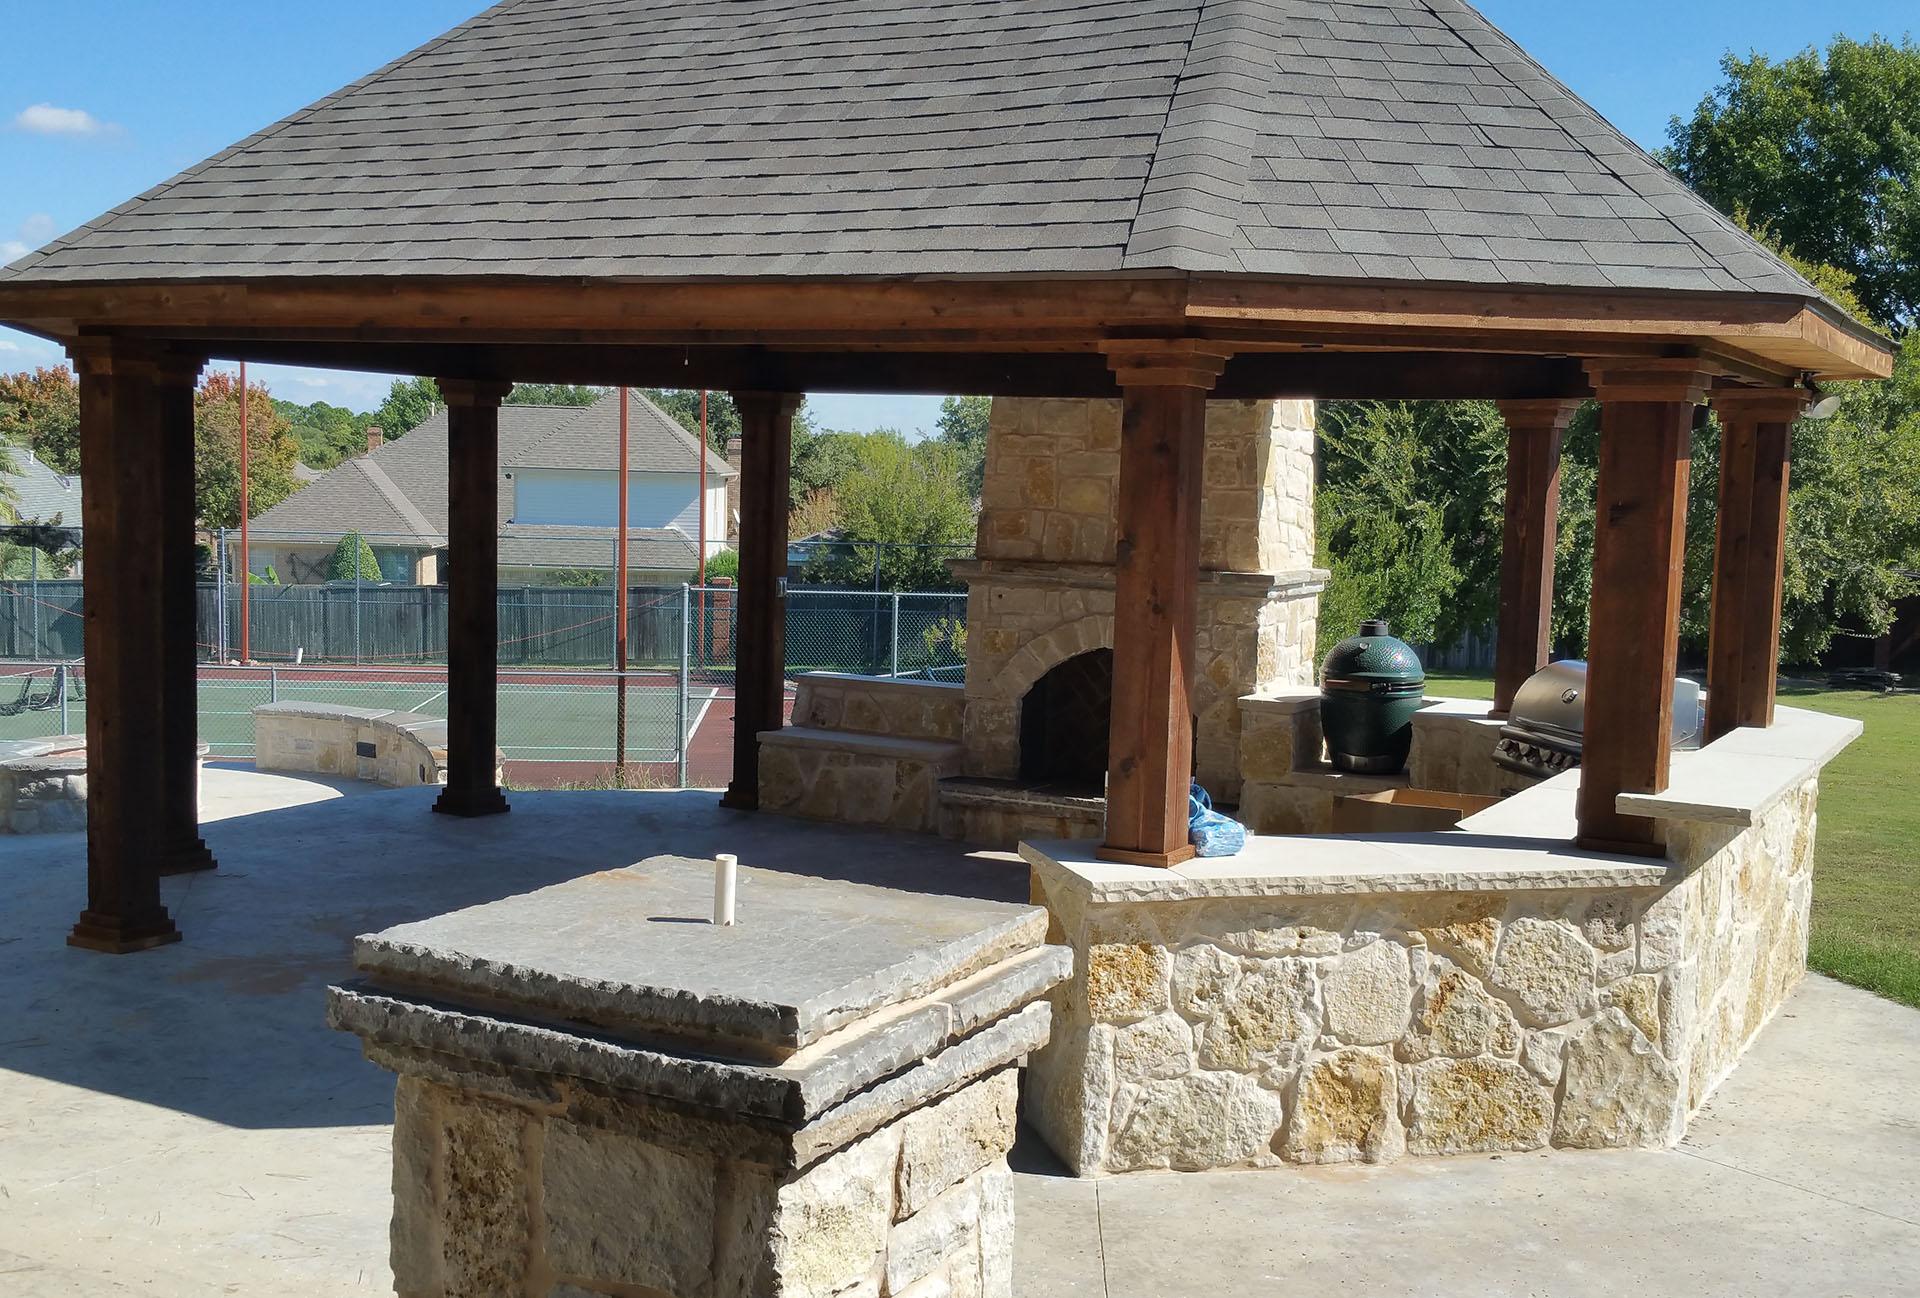 outdoor gazebo create unique backyard experience with a custom gazebo THCHICR